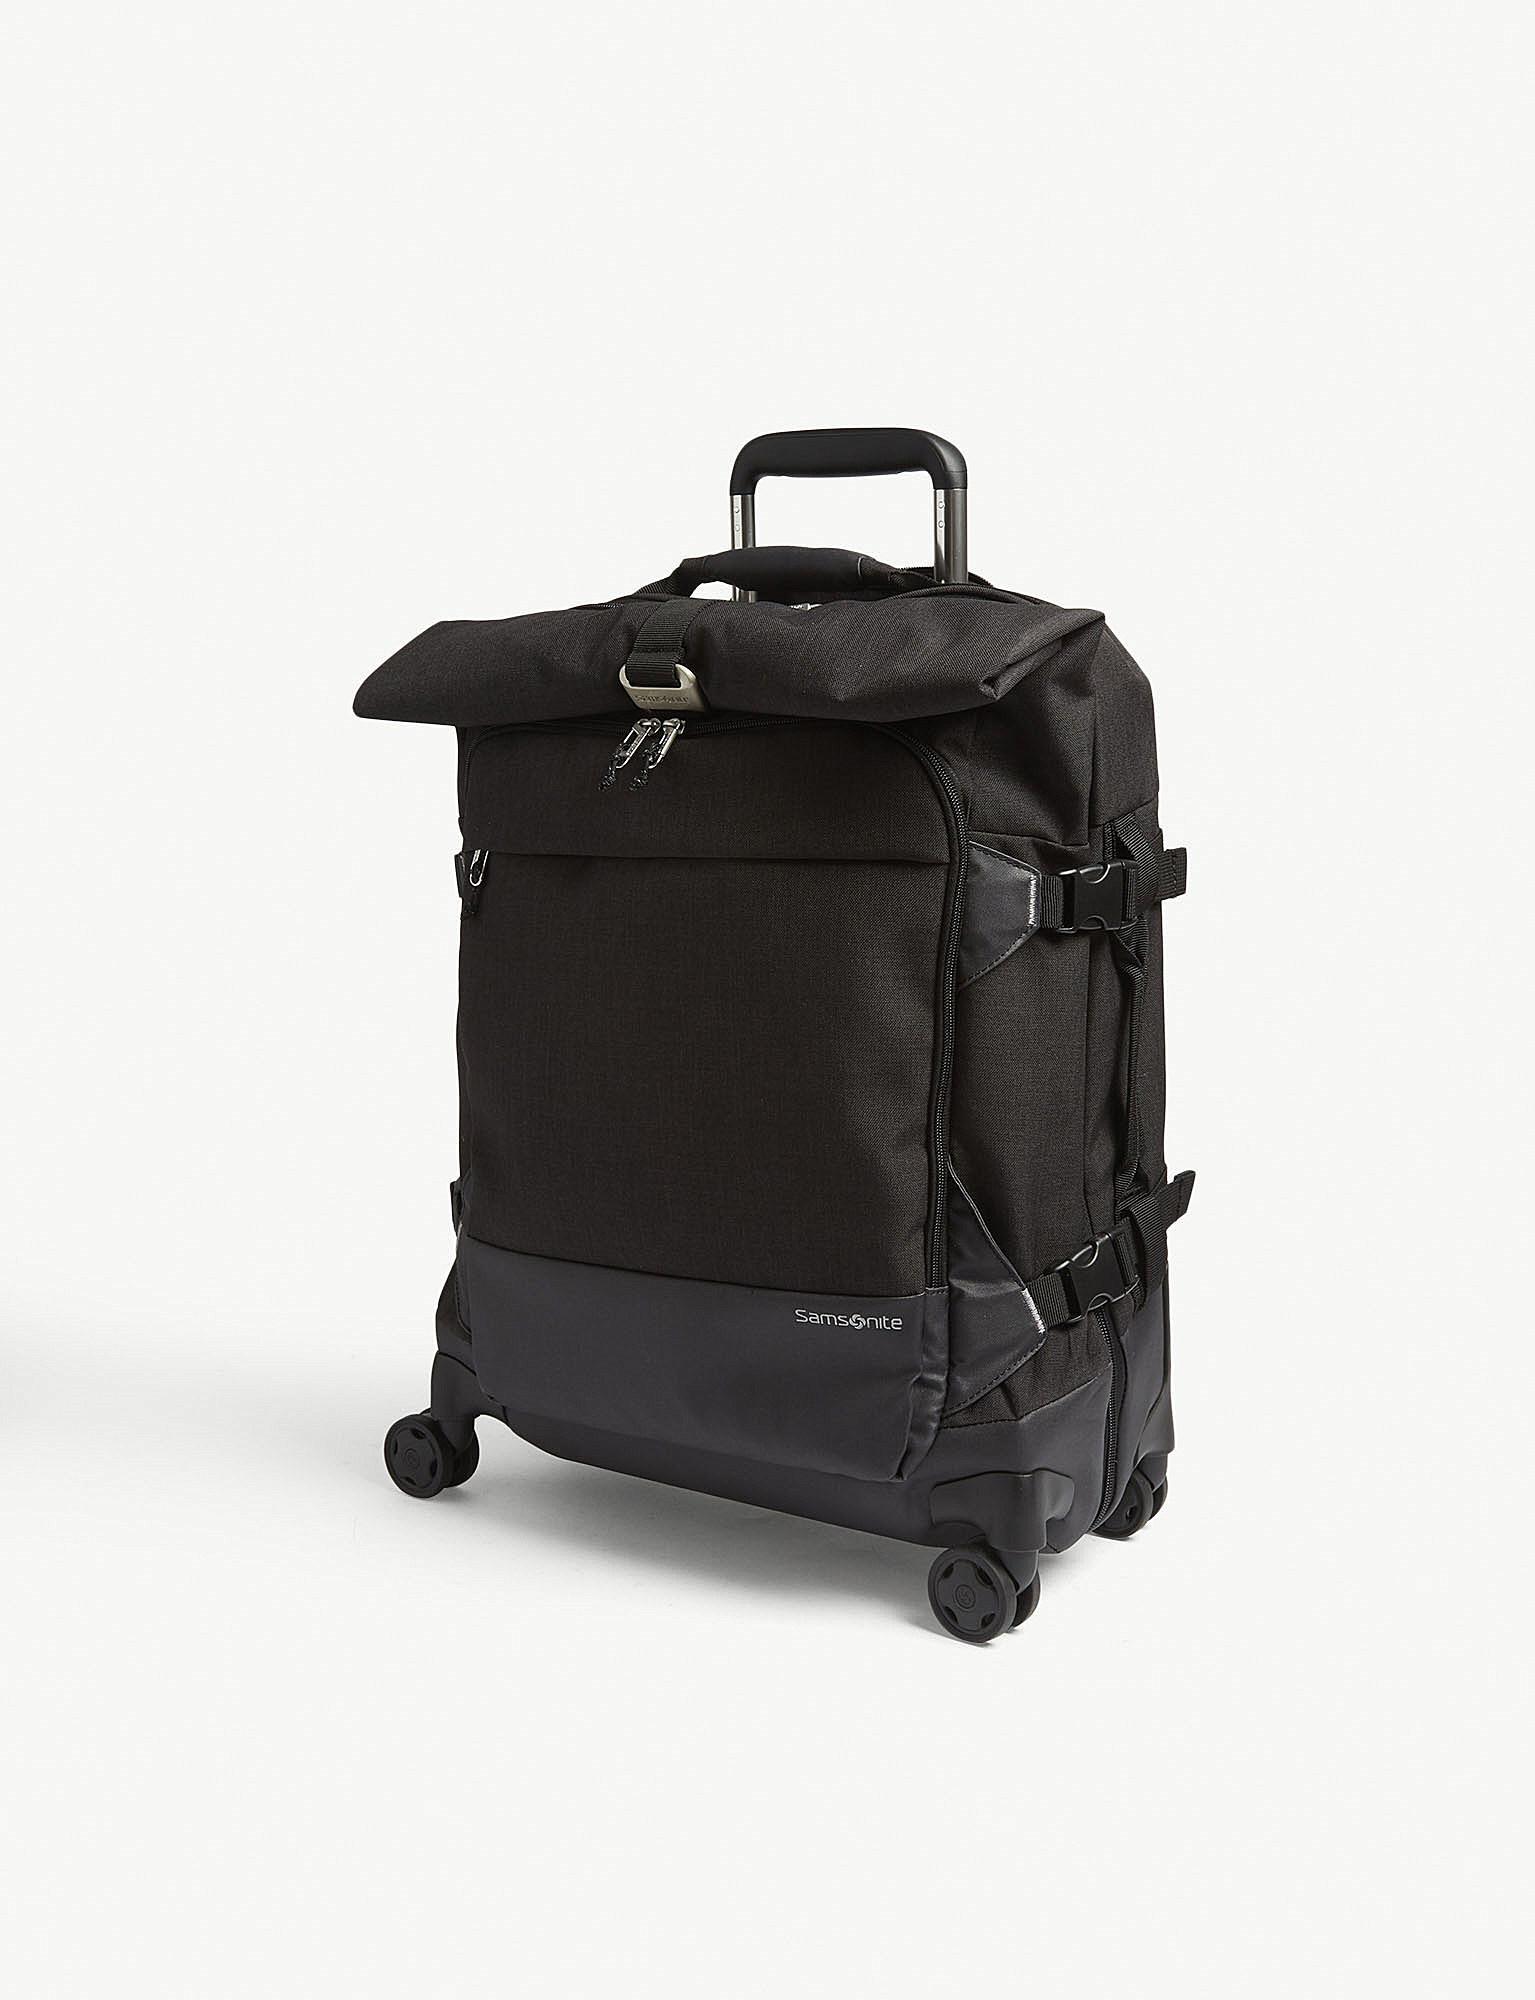 Samsonite - Black Ziproll Eco Two-wheel Duffle Back 55cm for Men - Lyst.  View fullscreen 13c409509e